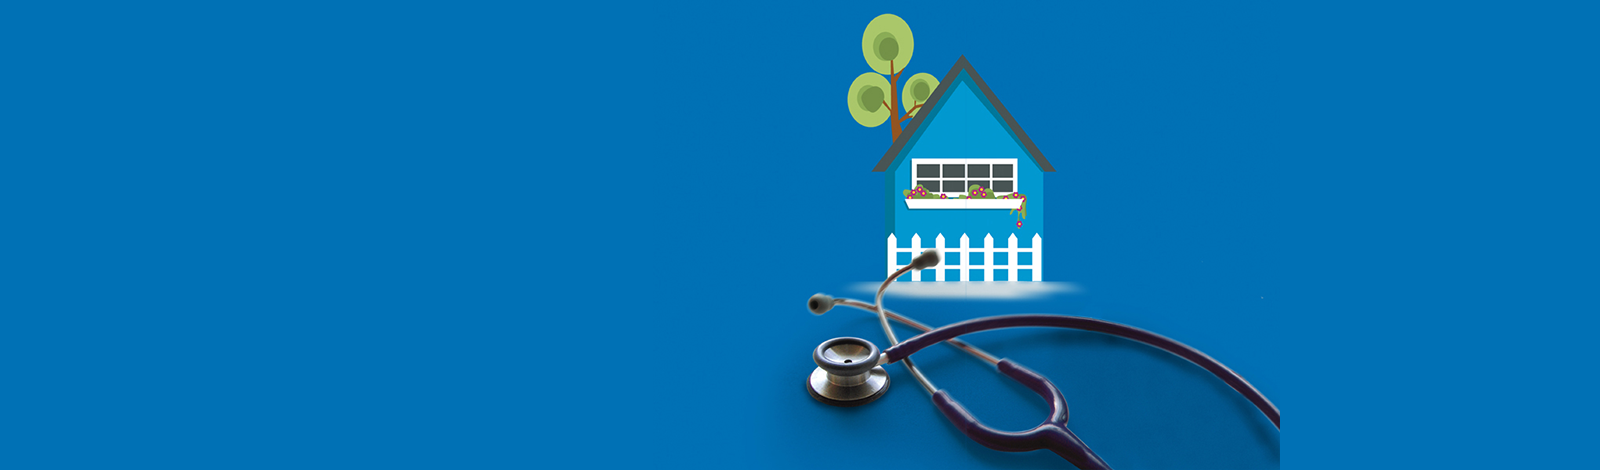 stetoscope-diagnostics-immobiliers2